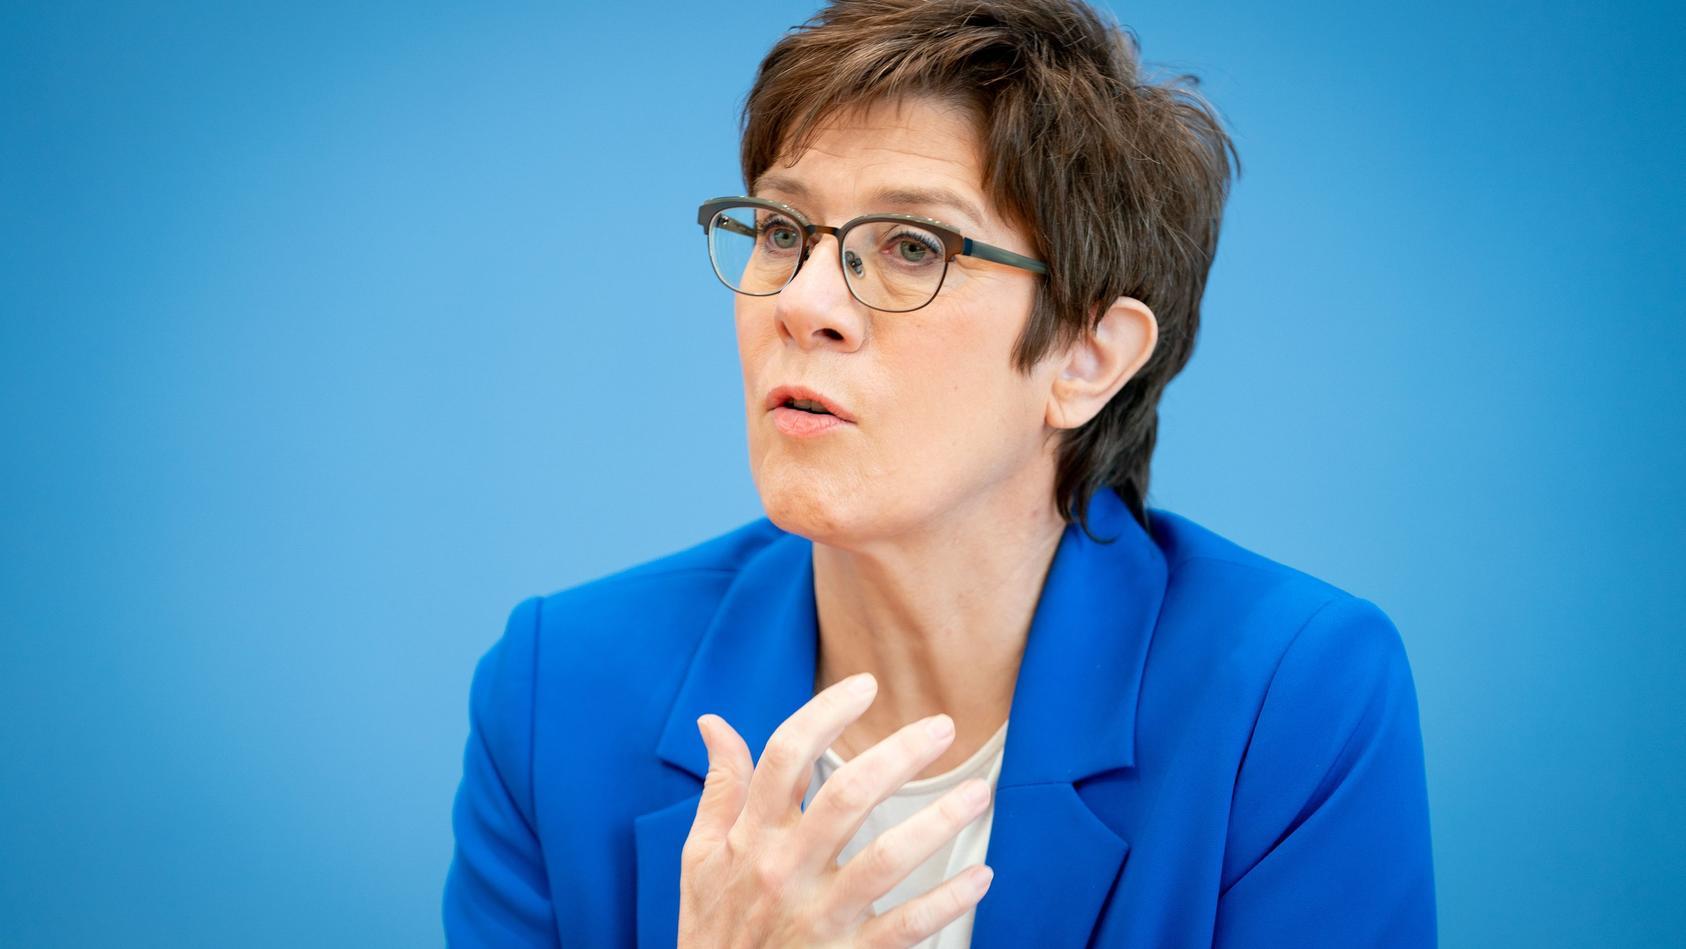 In Unruhe über den Truppenabzug: Bundesverteidigungsministerin Kramp-Karrenbauer